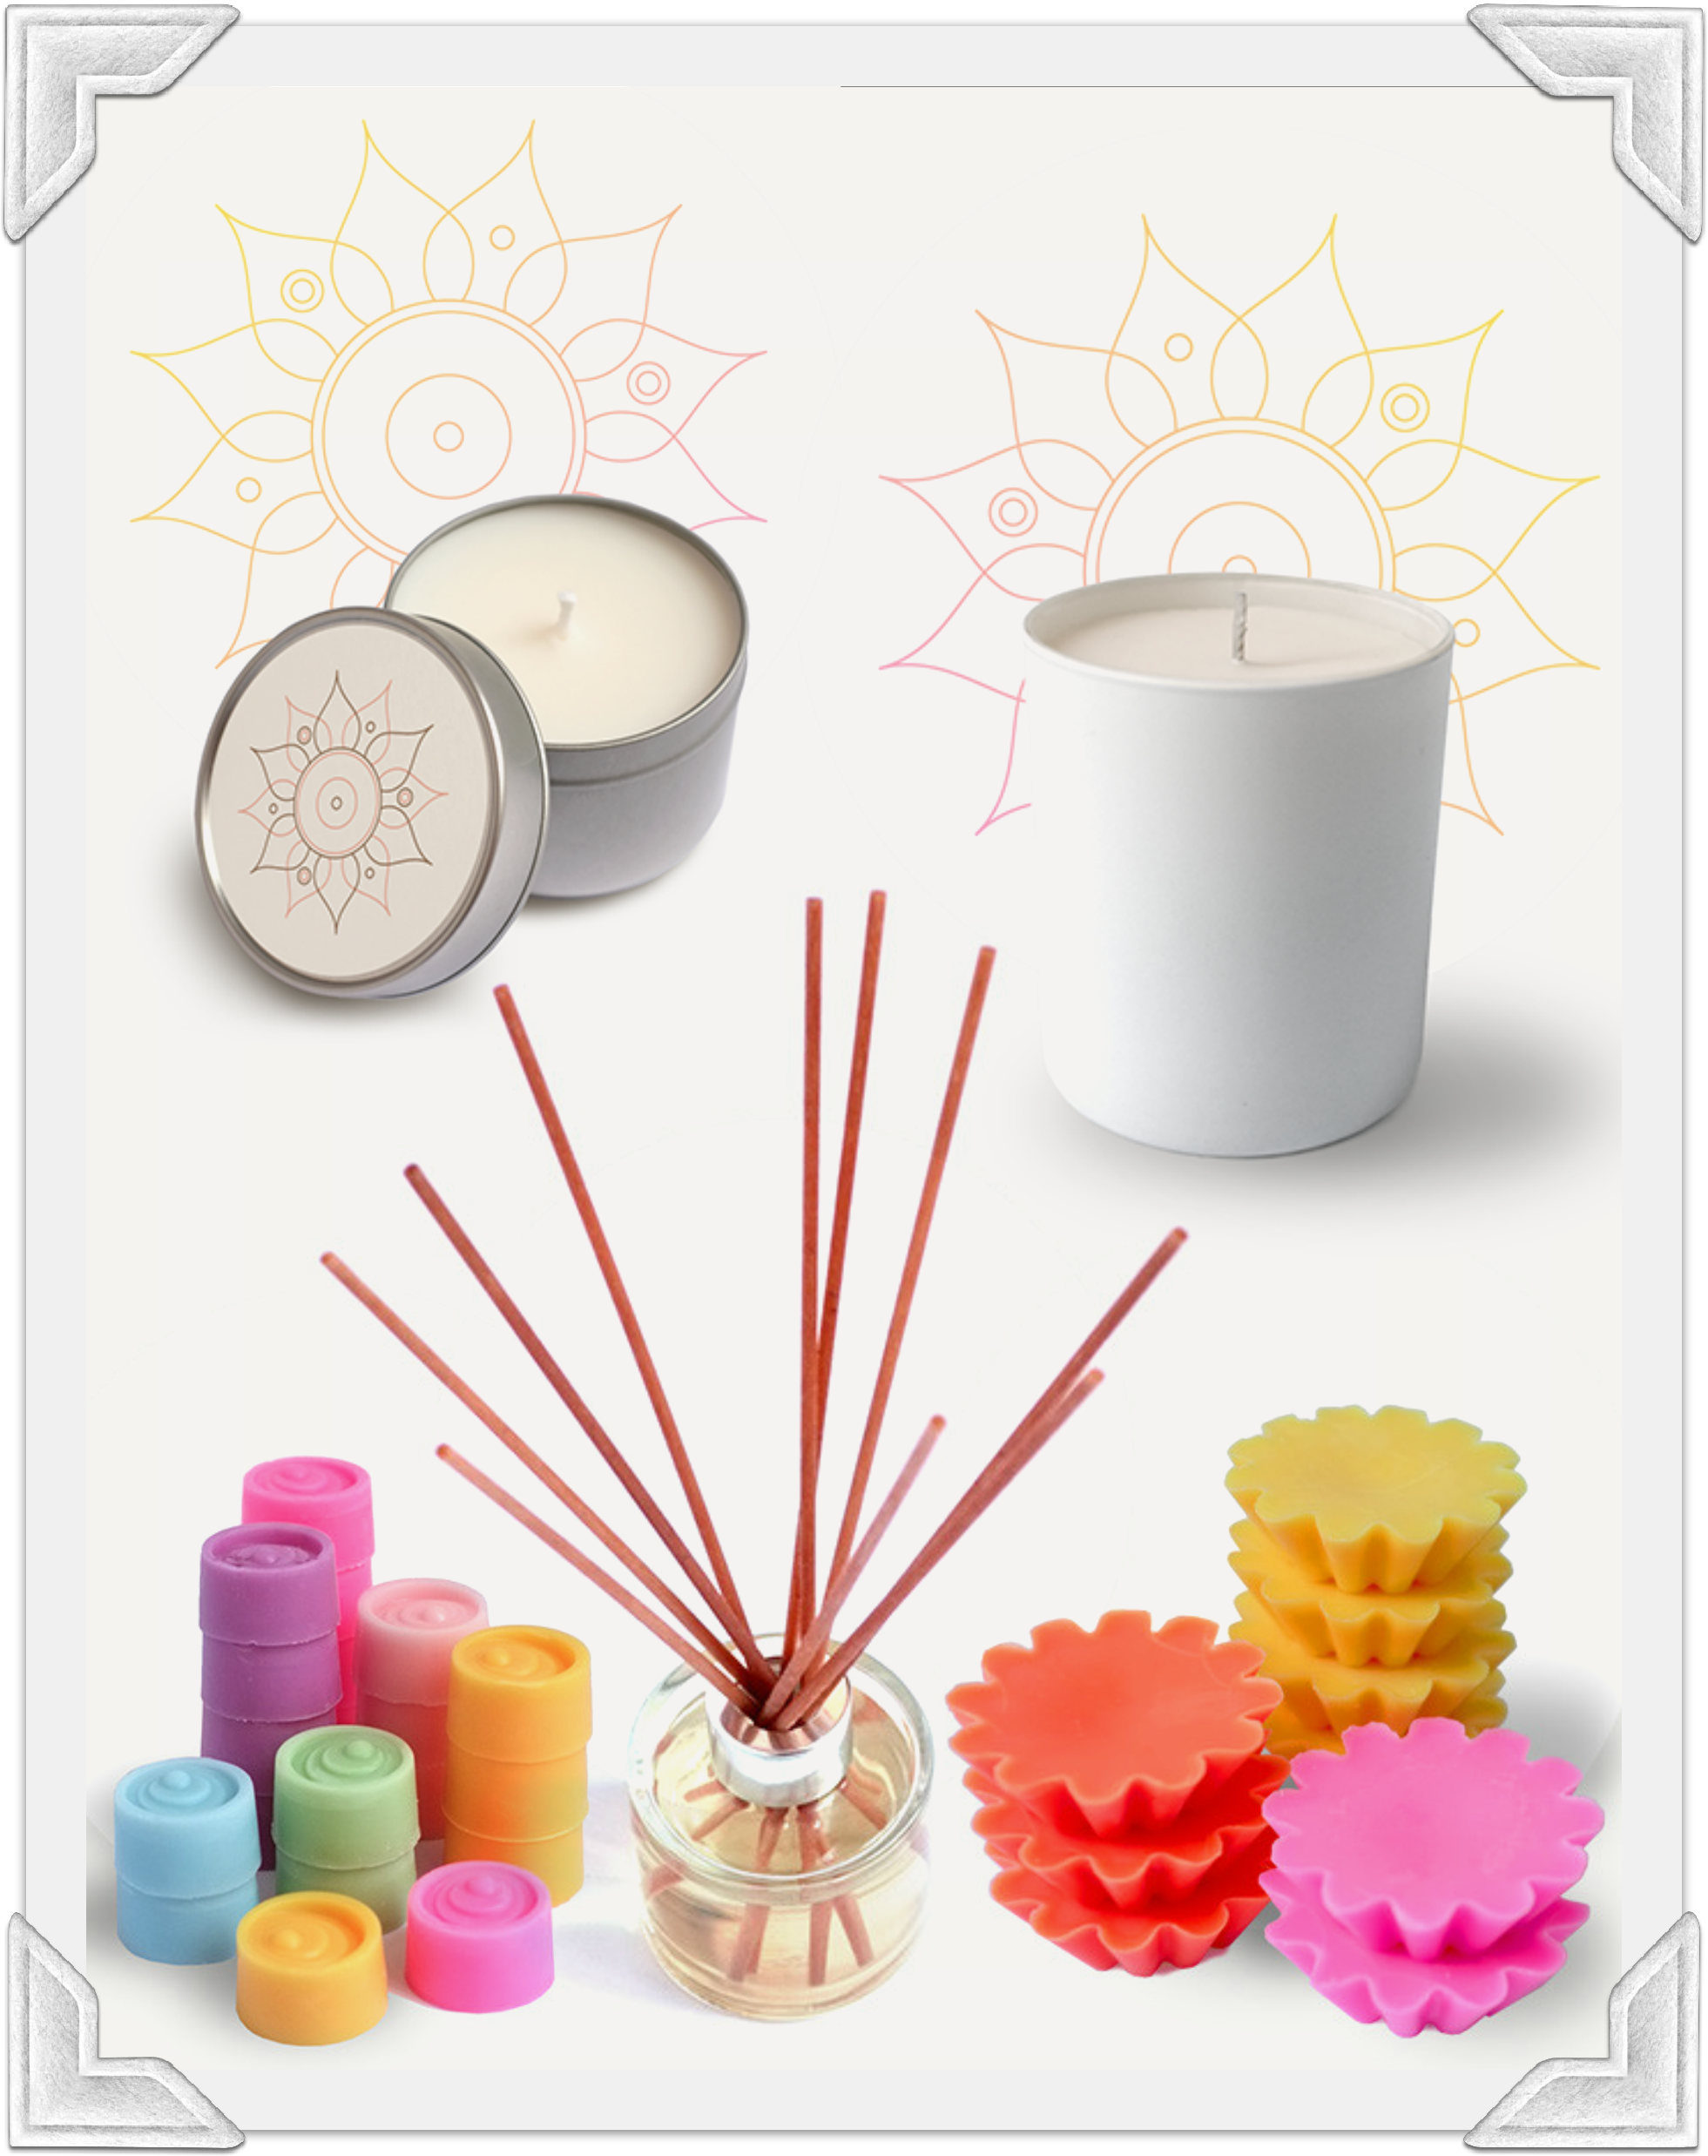 GlowHush Products